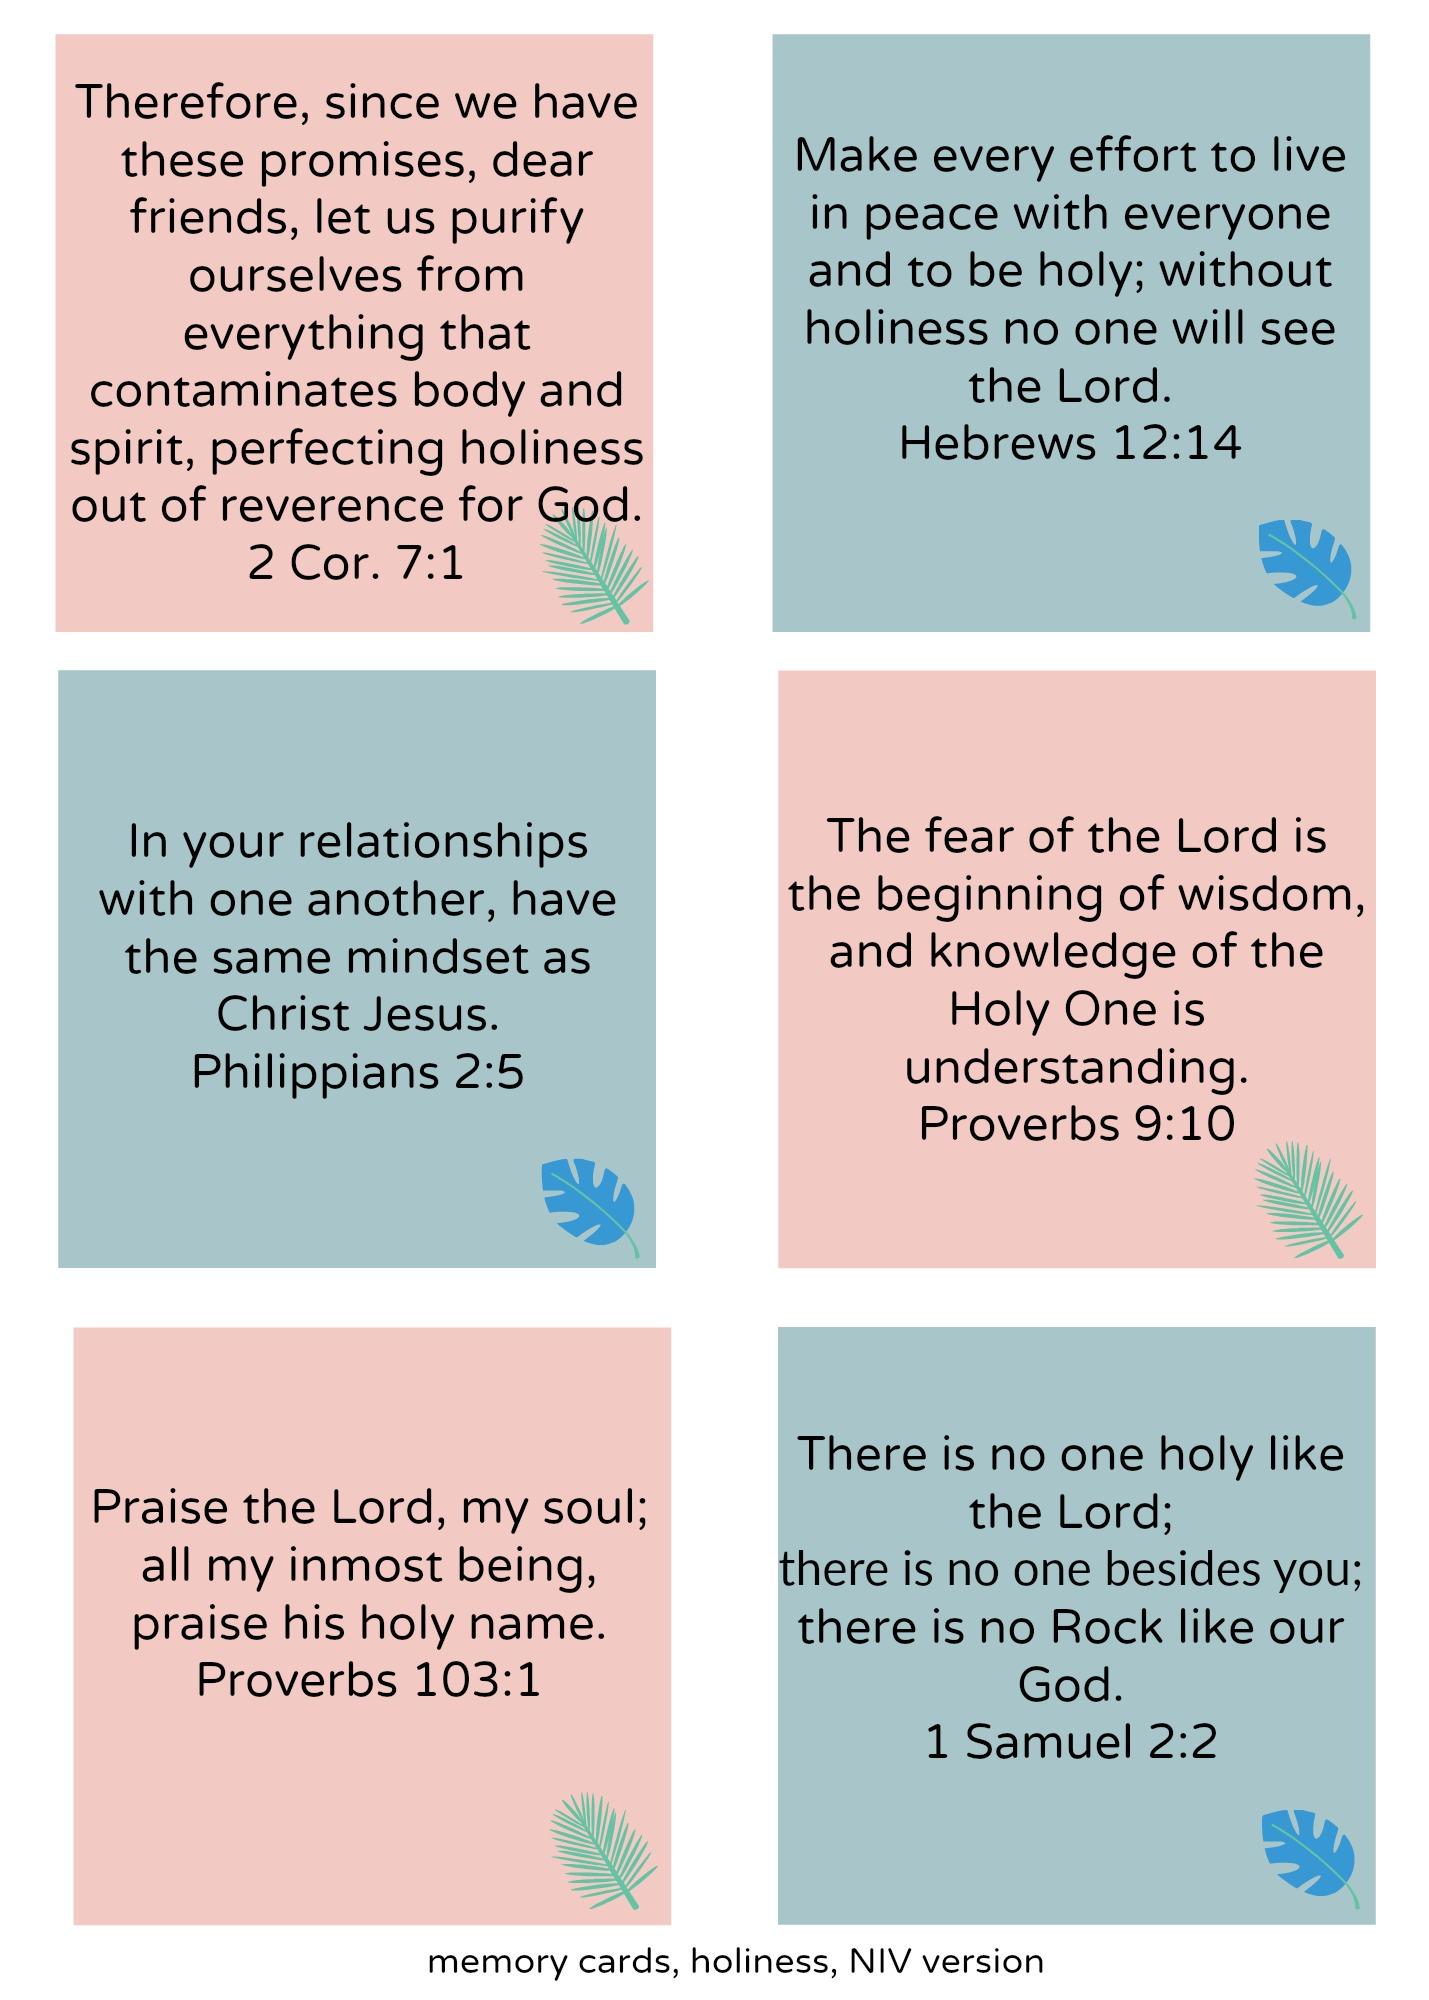 memory cards holiness I 8 habits of holiness to cultivate I Christian holiness I Christian habits I Devotion I prayer I women's retreat I Christian Women's retreat I Above the Waves II #holyhabits #holiness